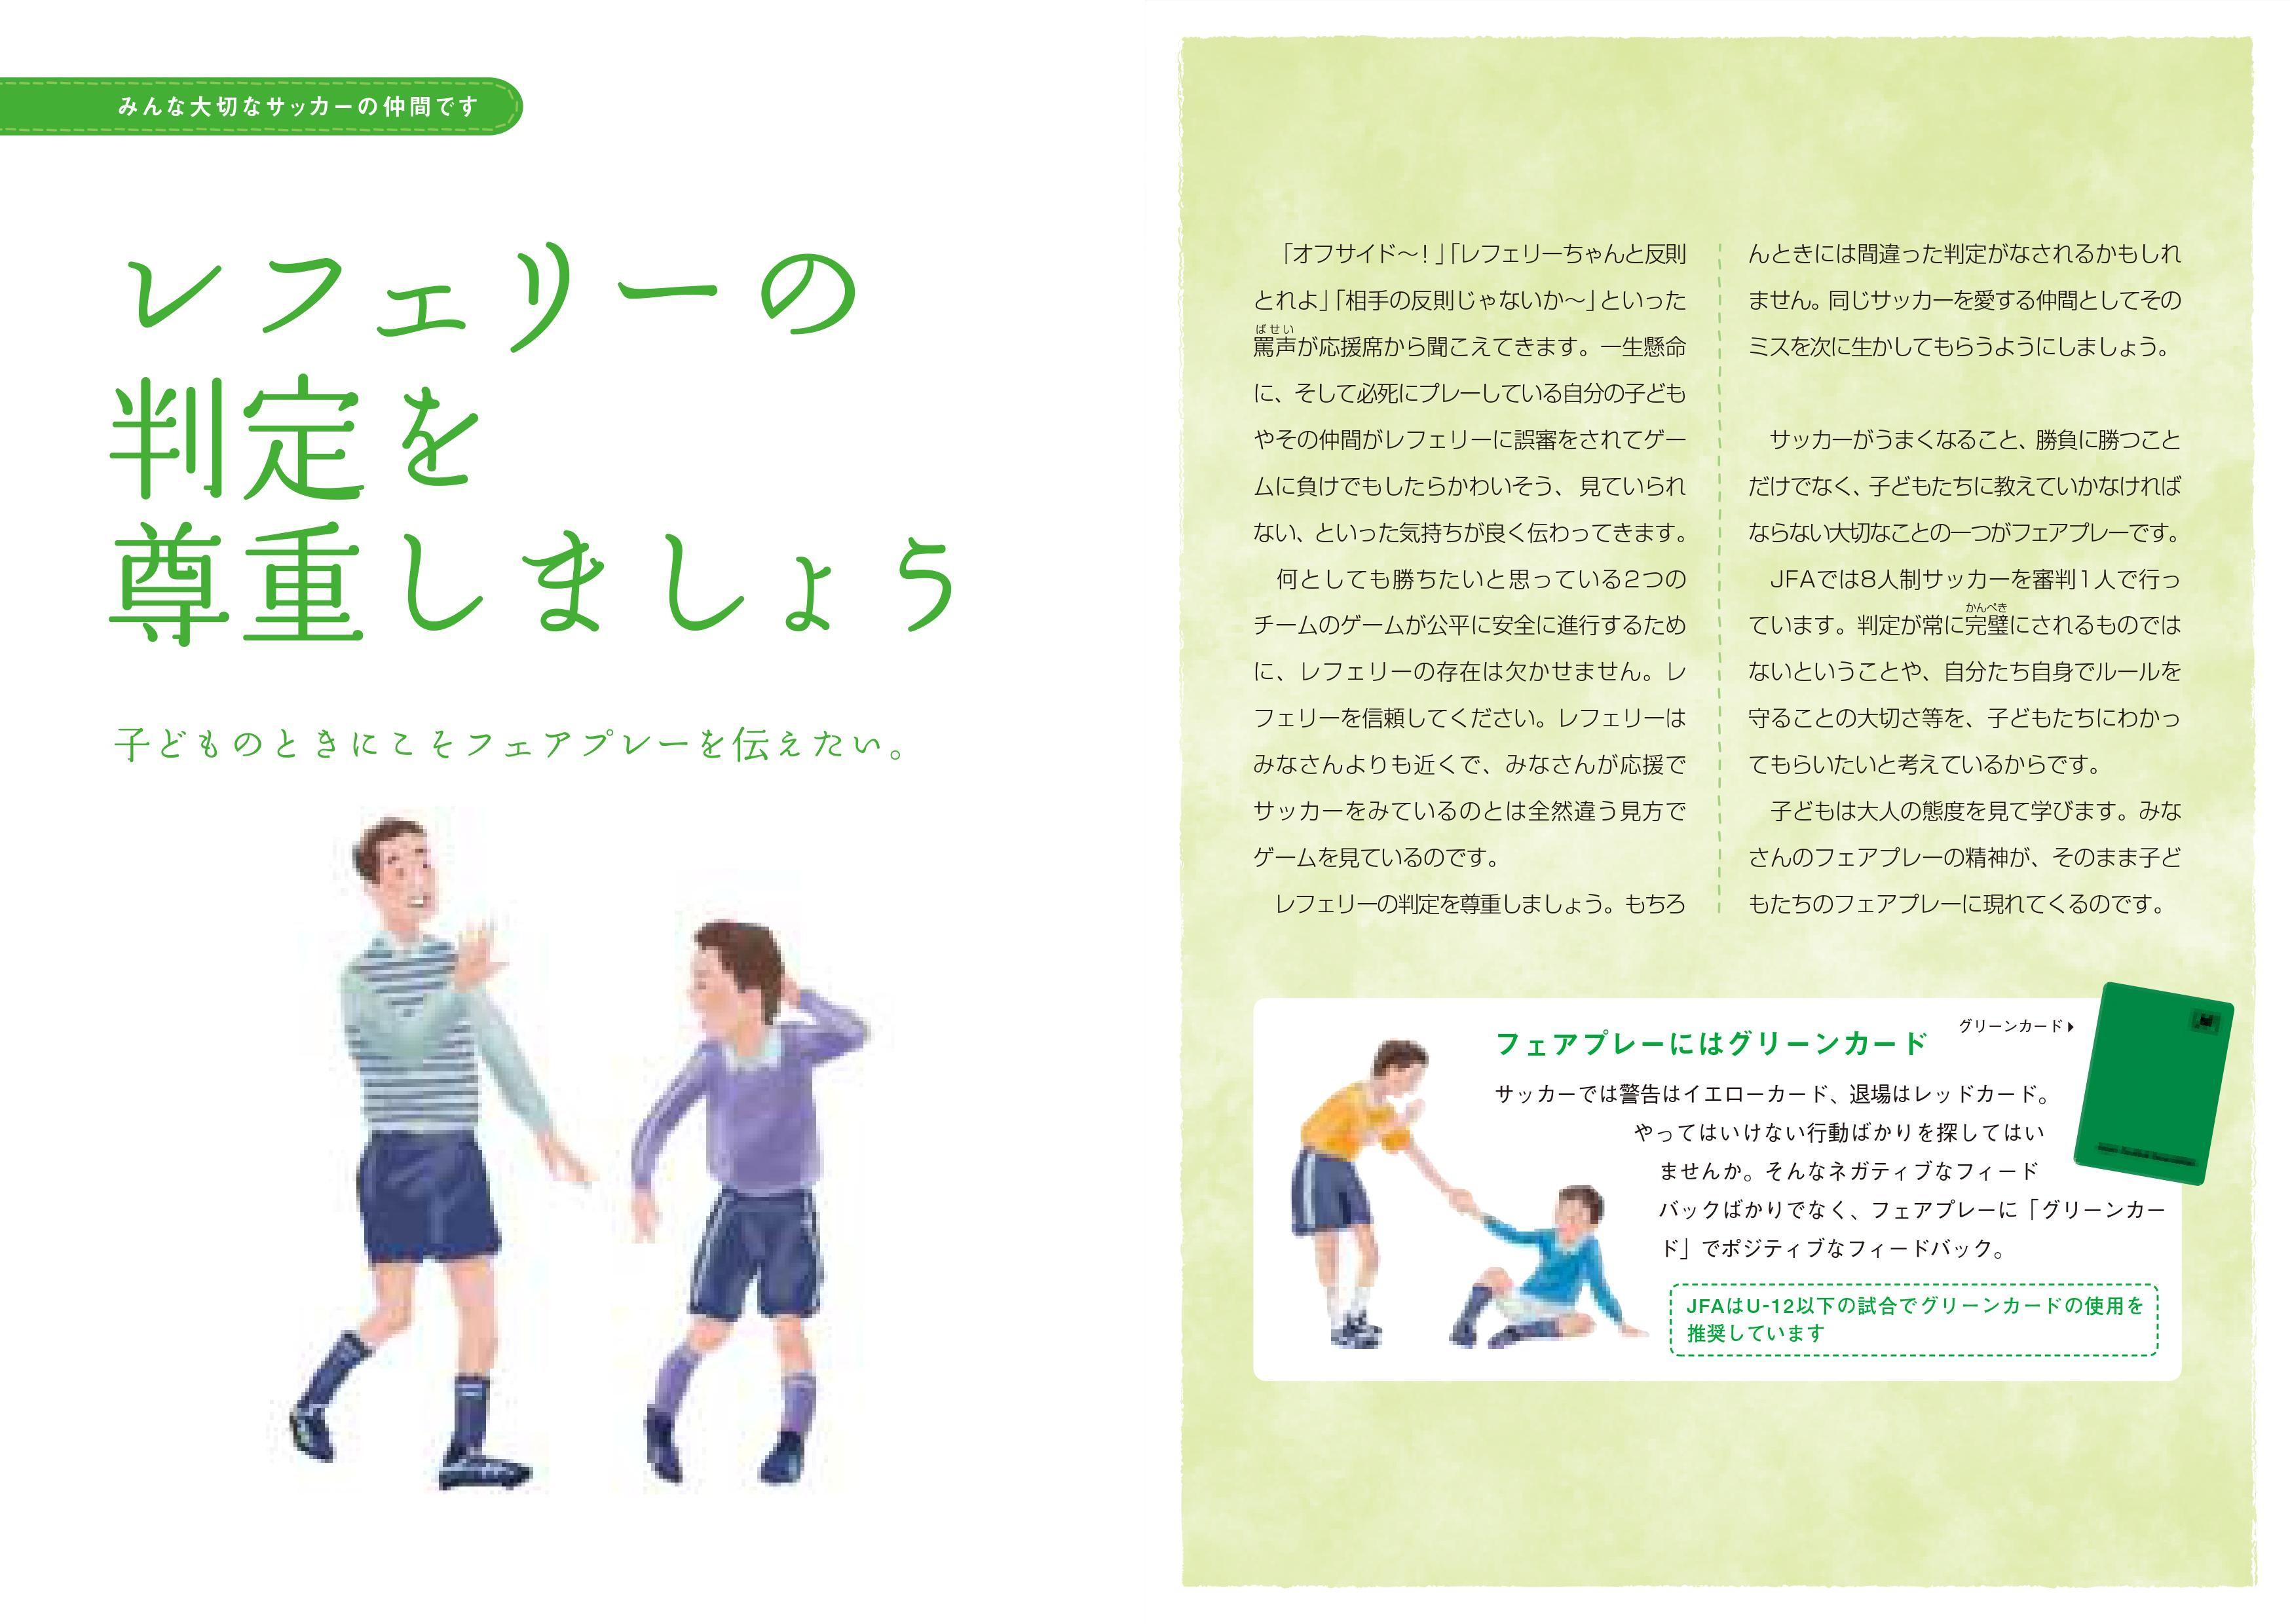 JFA handbook _12